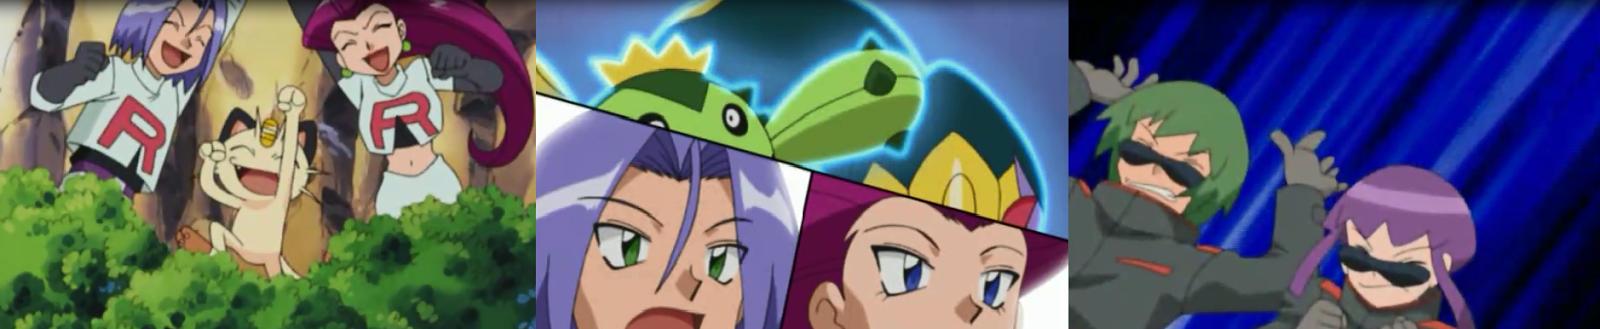 Pokemon Capitulo 47 Temporada 7 Loco Como Un Lunatone